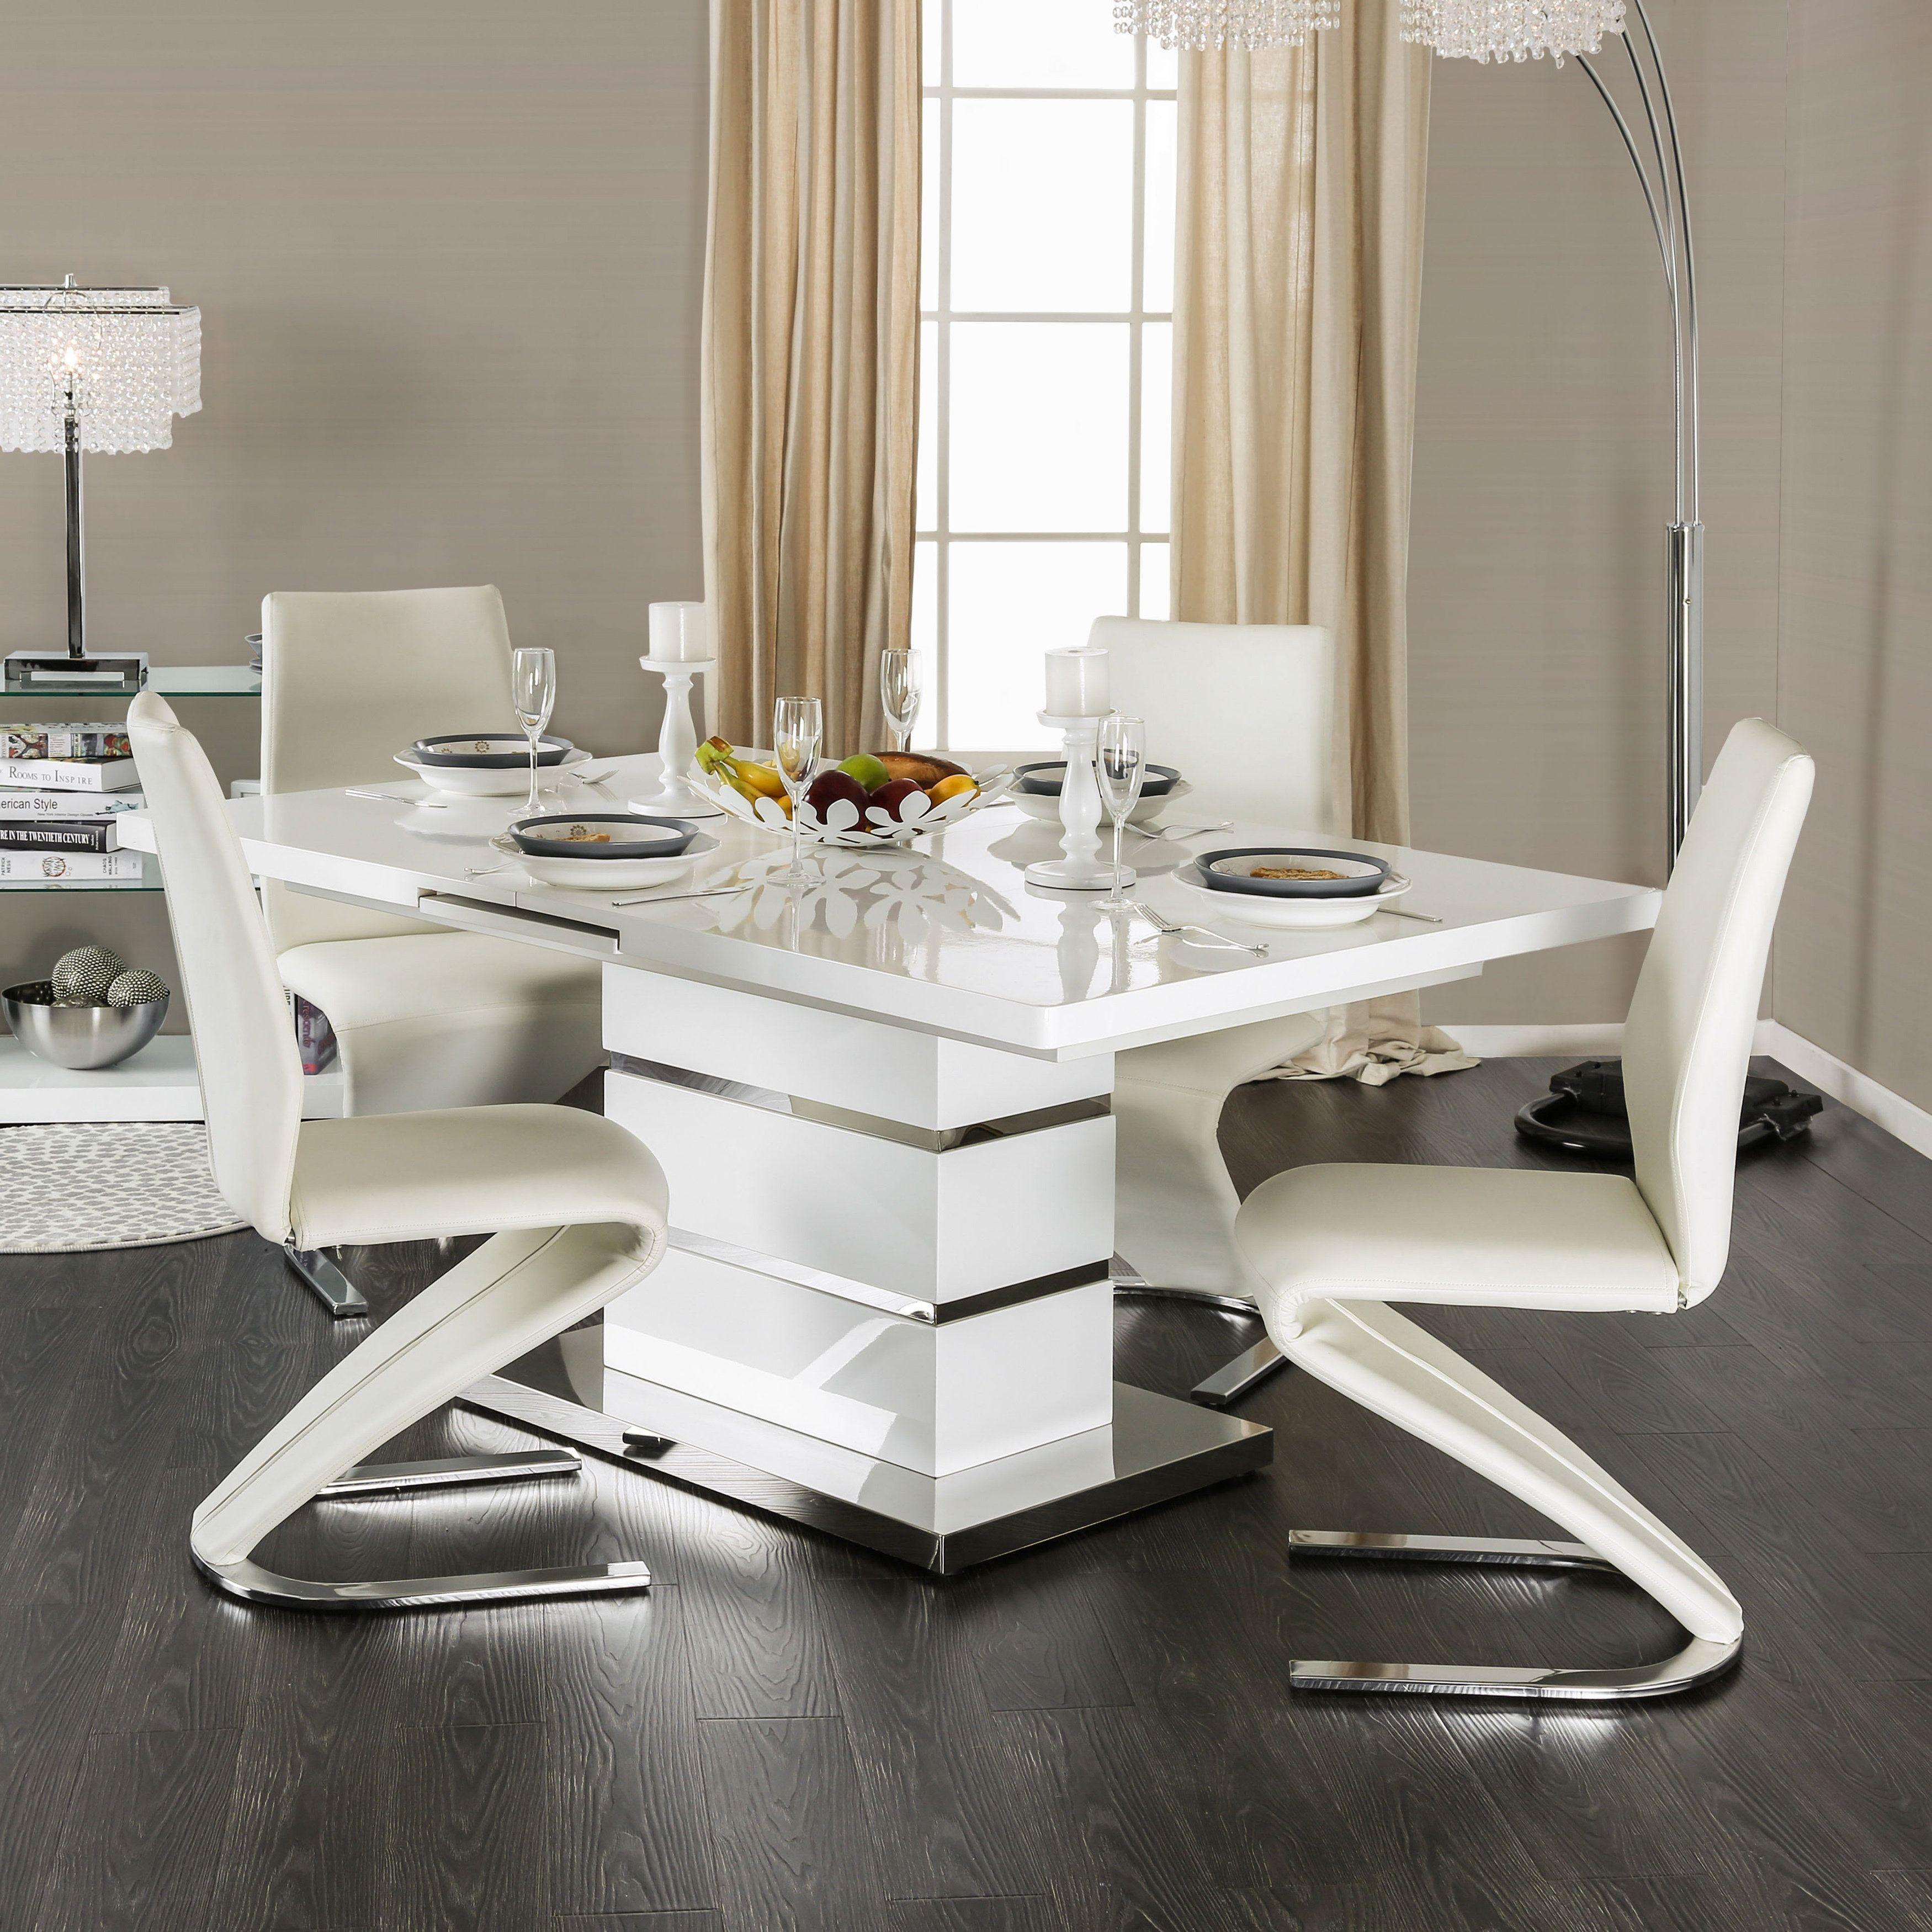 Furniture Of America Novas Contemporary 5 Piece Glossy White